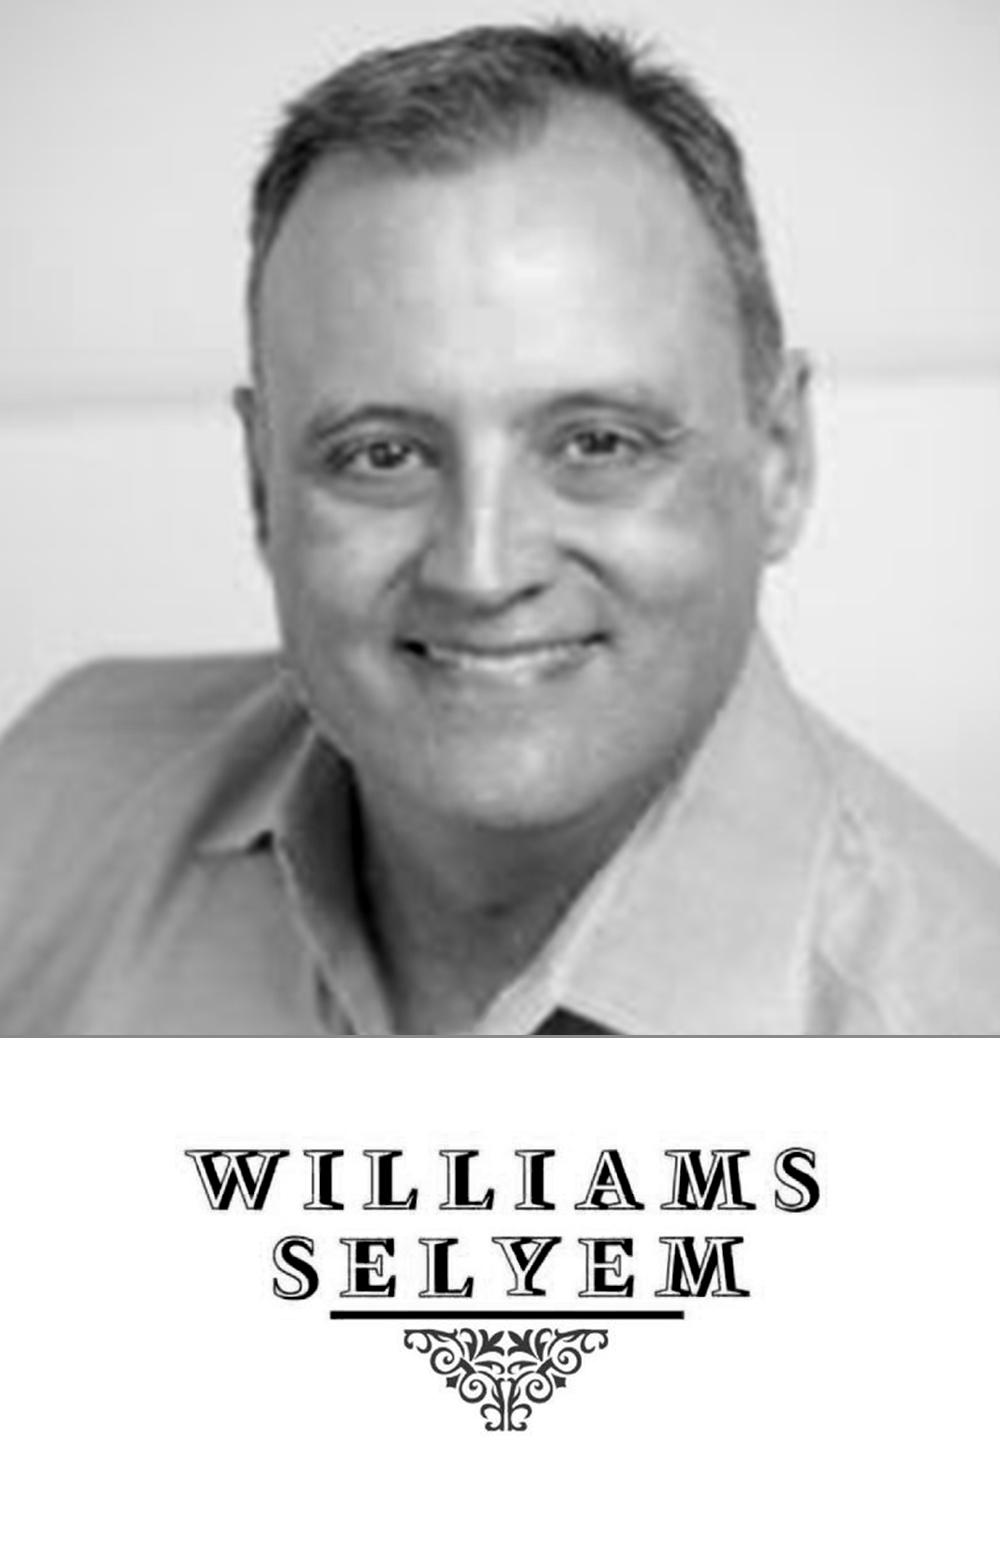 WILLIAMS-SELYEM-WINERY-BLACK-WHITE.jpg